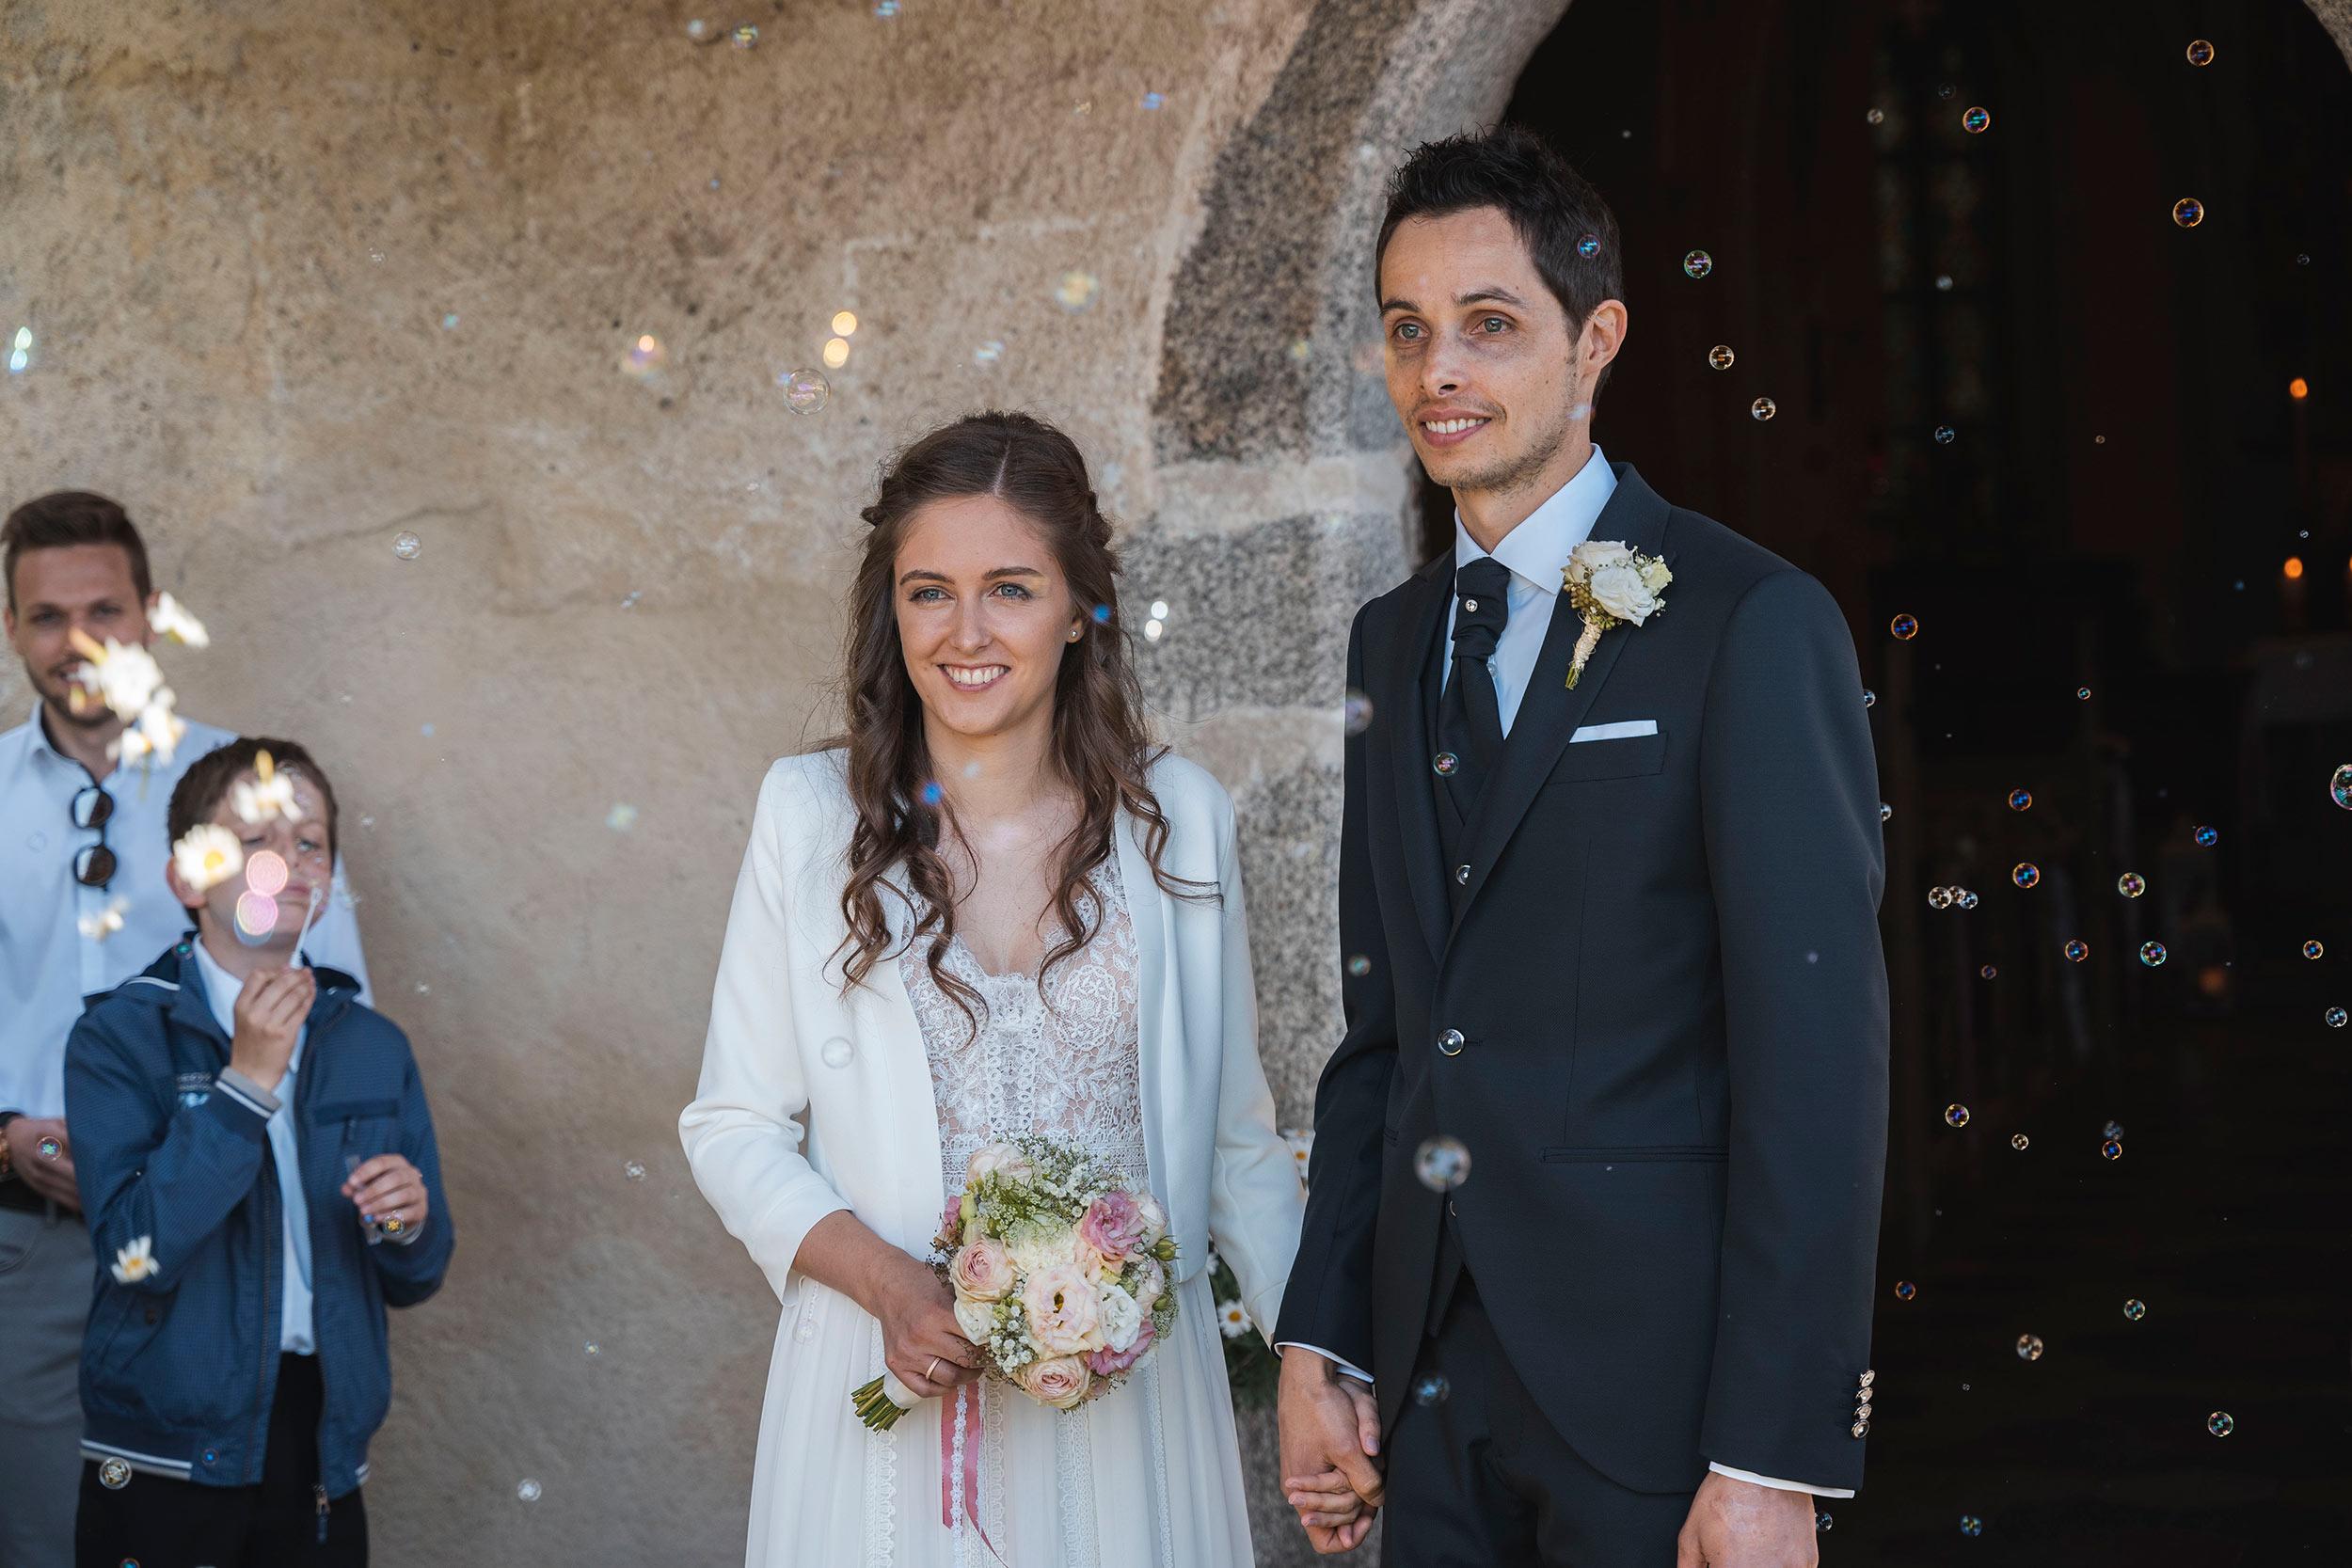 Evi_&_Christian_Hochzeit_01-06-2019_265